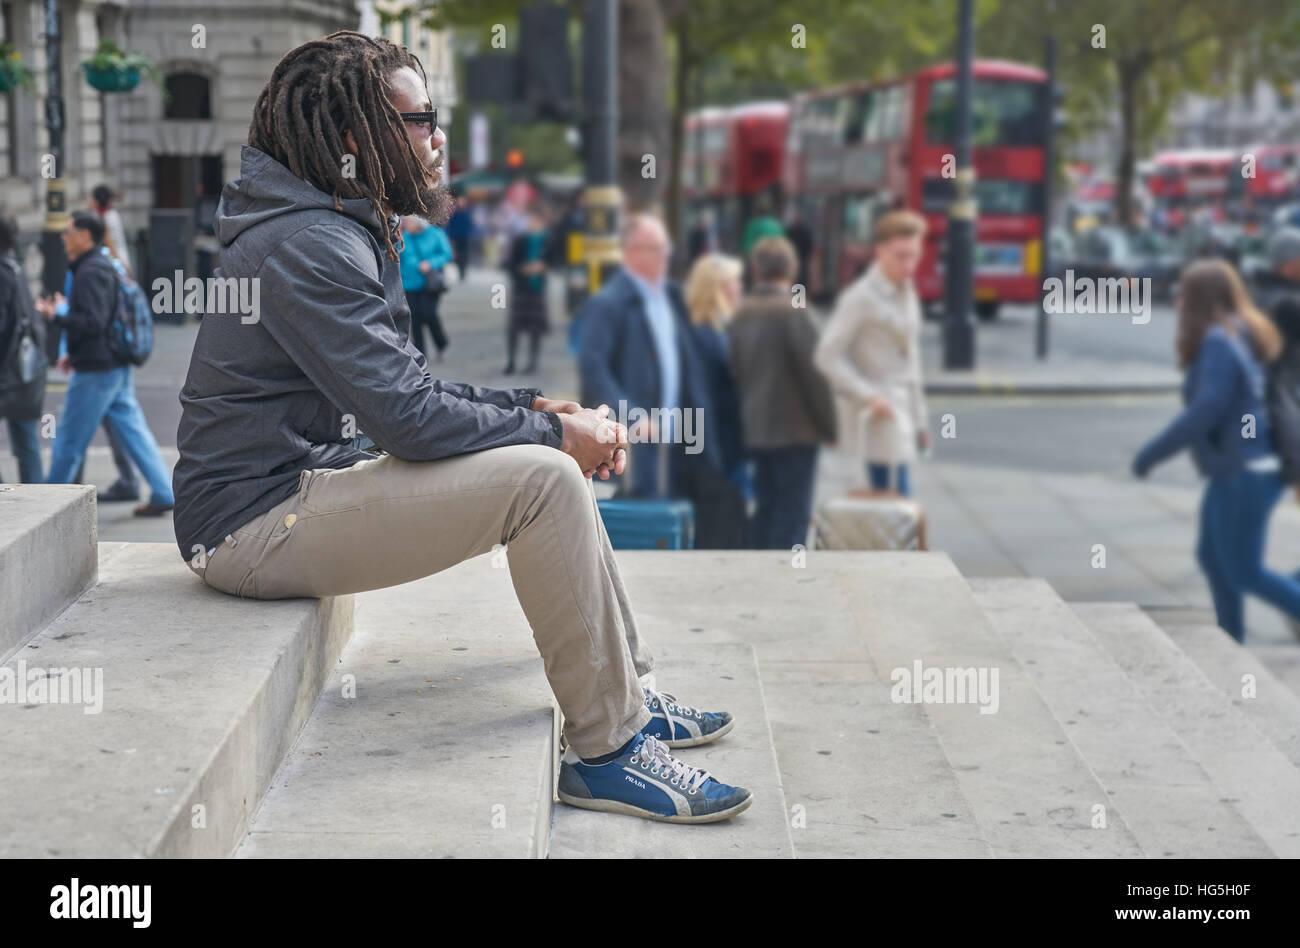 black man.  Man contemplating.   dreadlocks.  rastafarian.   Alone in the city. - Stock Image